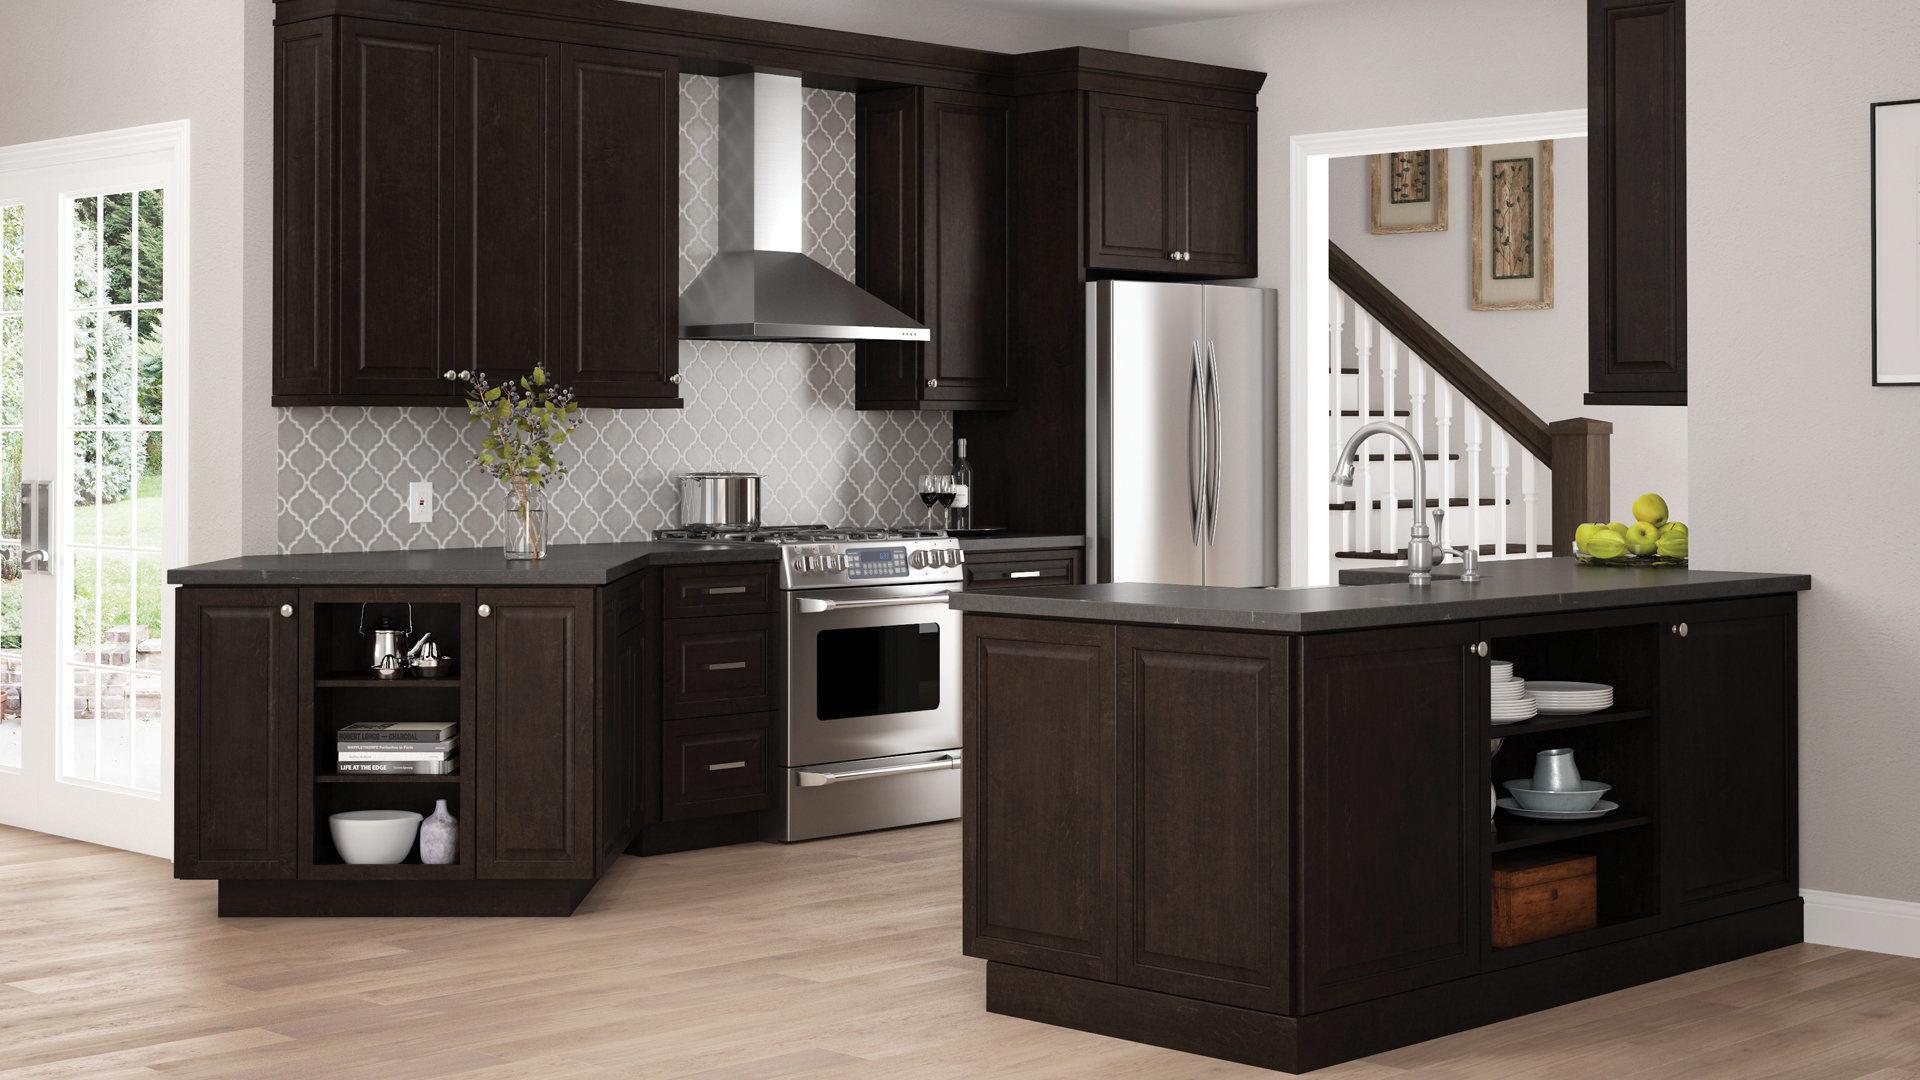 Home Depot Kitchen And Bath Design